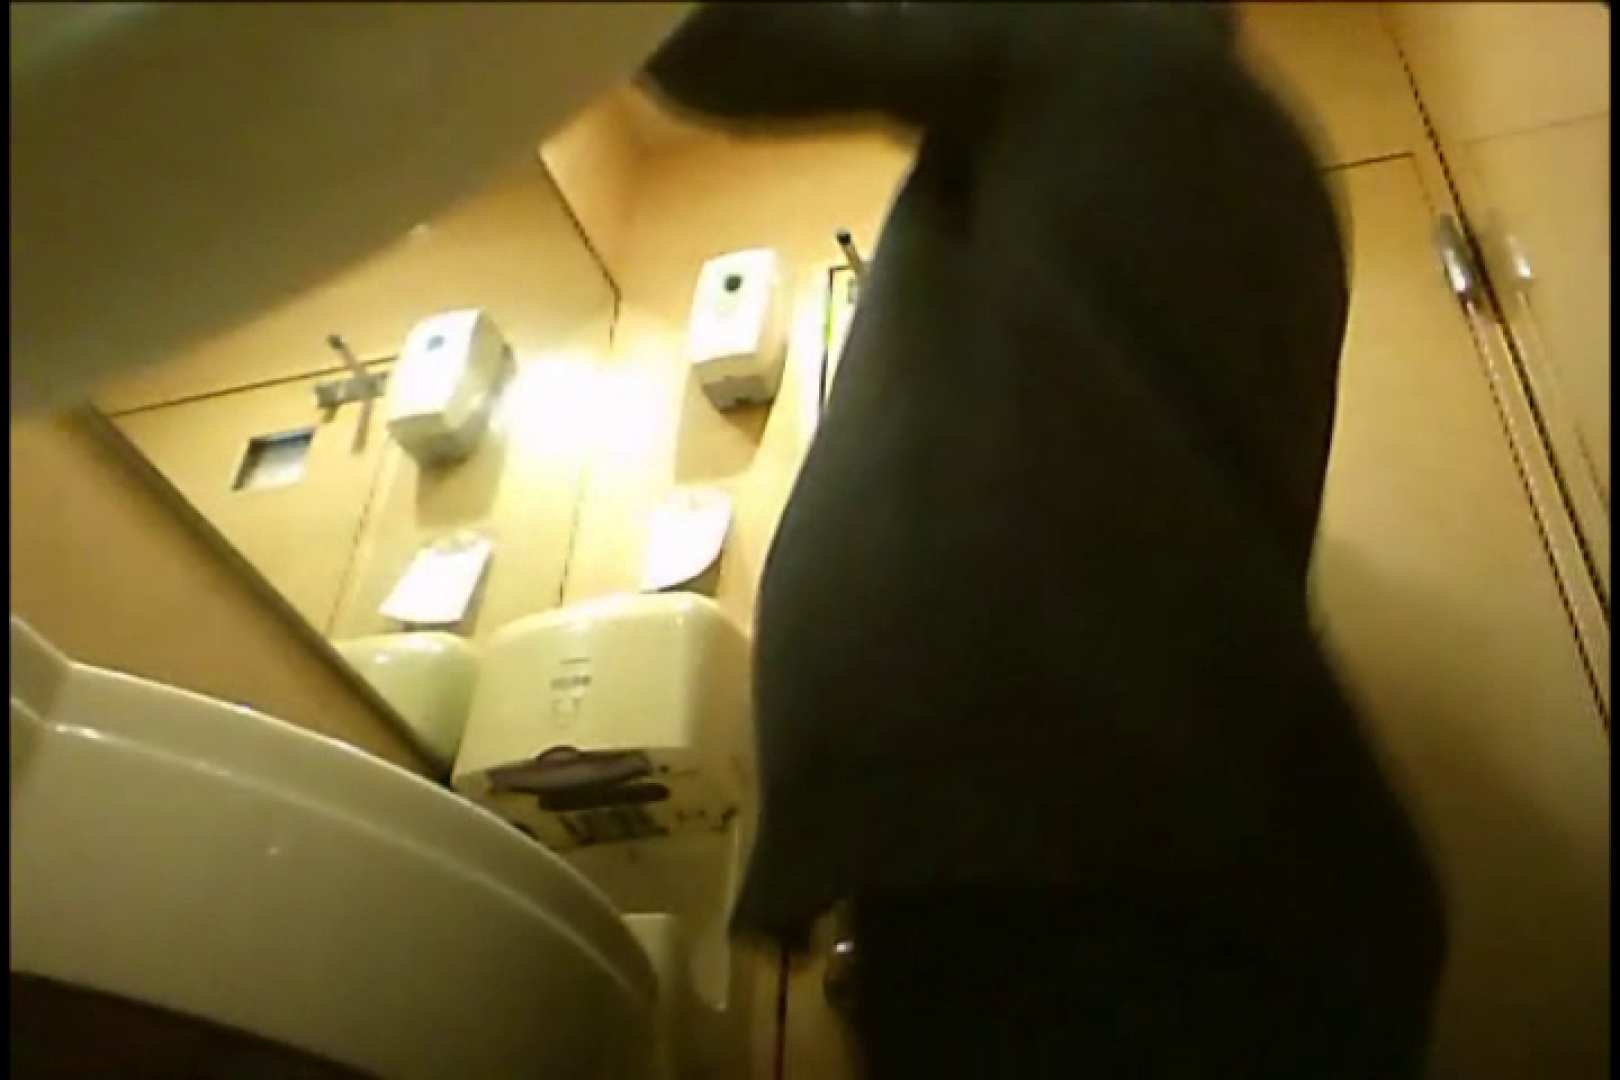 Gボーイ初投稿!掴み取りさんの洗面所覗き!in新幹線!VOL.01 スーツボーイズ | 男天国  103pic 19